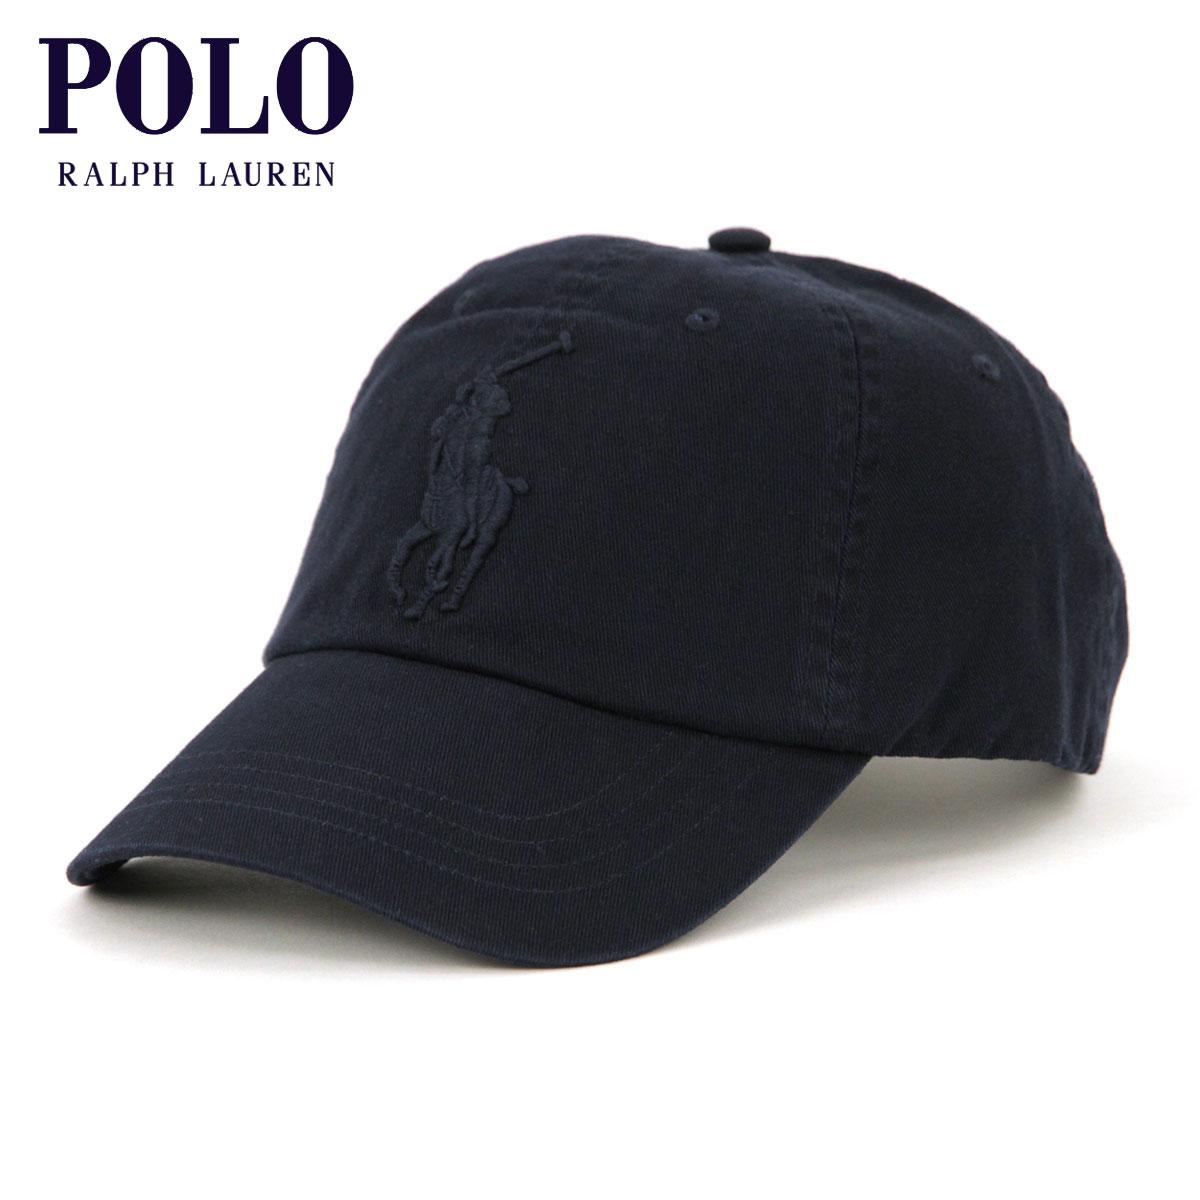 b76056f91 Polo Ralph Lauren cap men's regular article POLO RALPH LAUREN hat hat BIG  PONY COTTON CHINO BASEBALL CAP